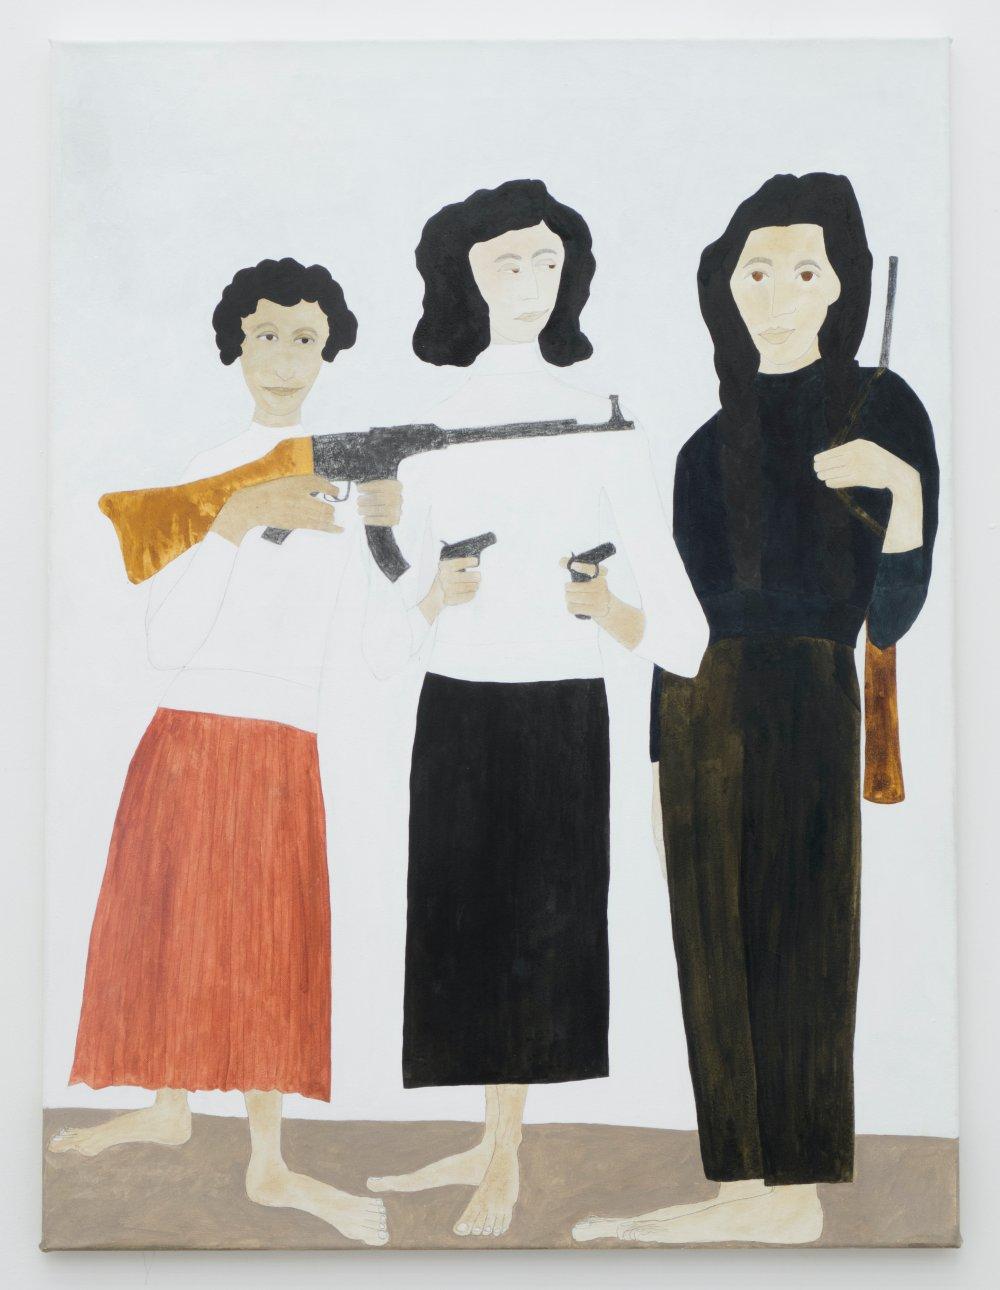 Zohra Drif, Djamila Bouhired and Hassiba Ben Bouali